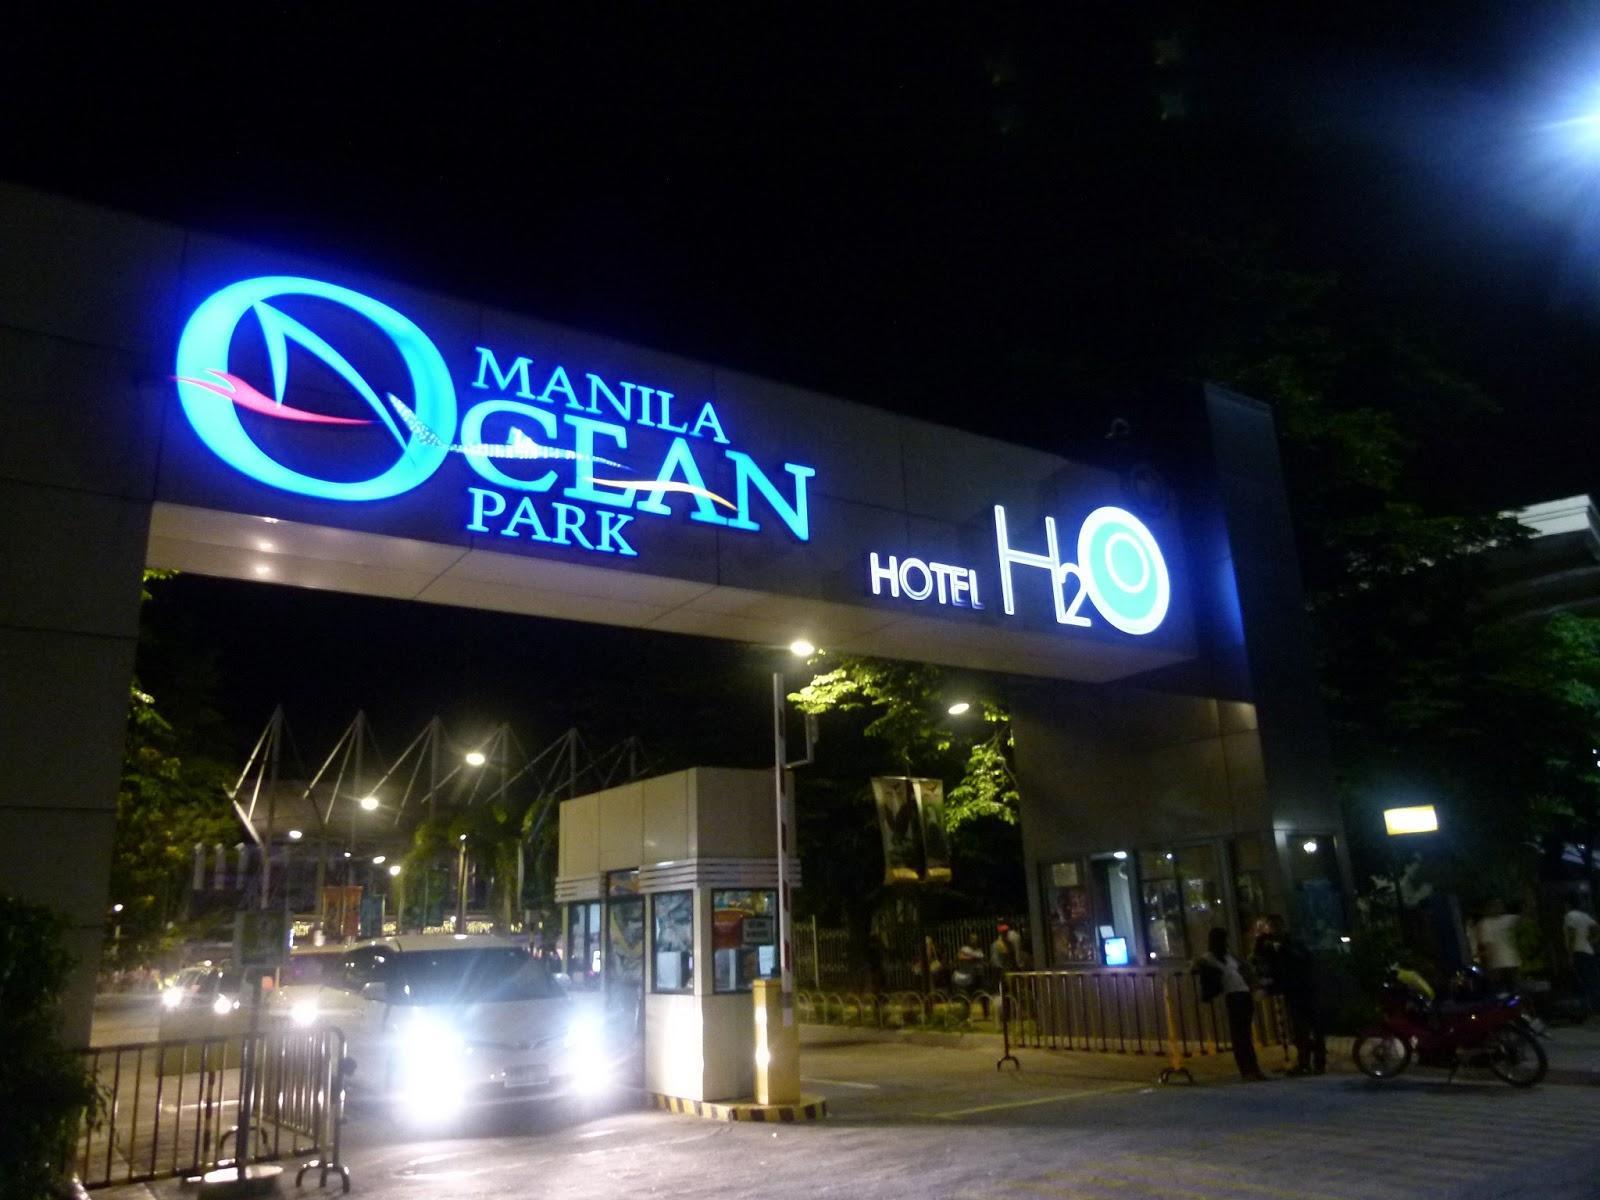 Manila Ocean Park Lakwatserong Tsinelas